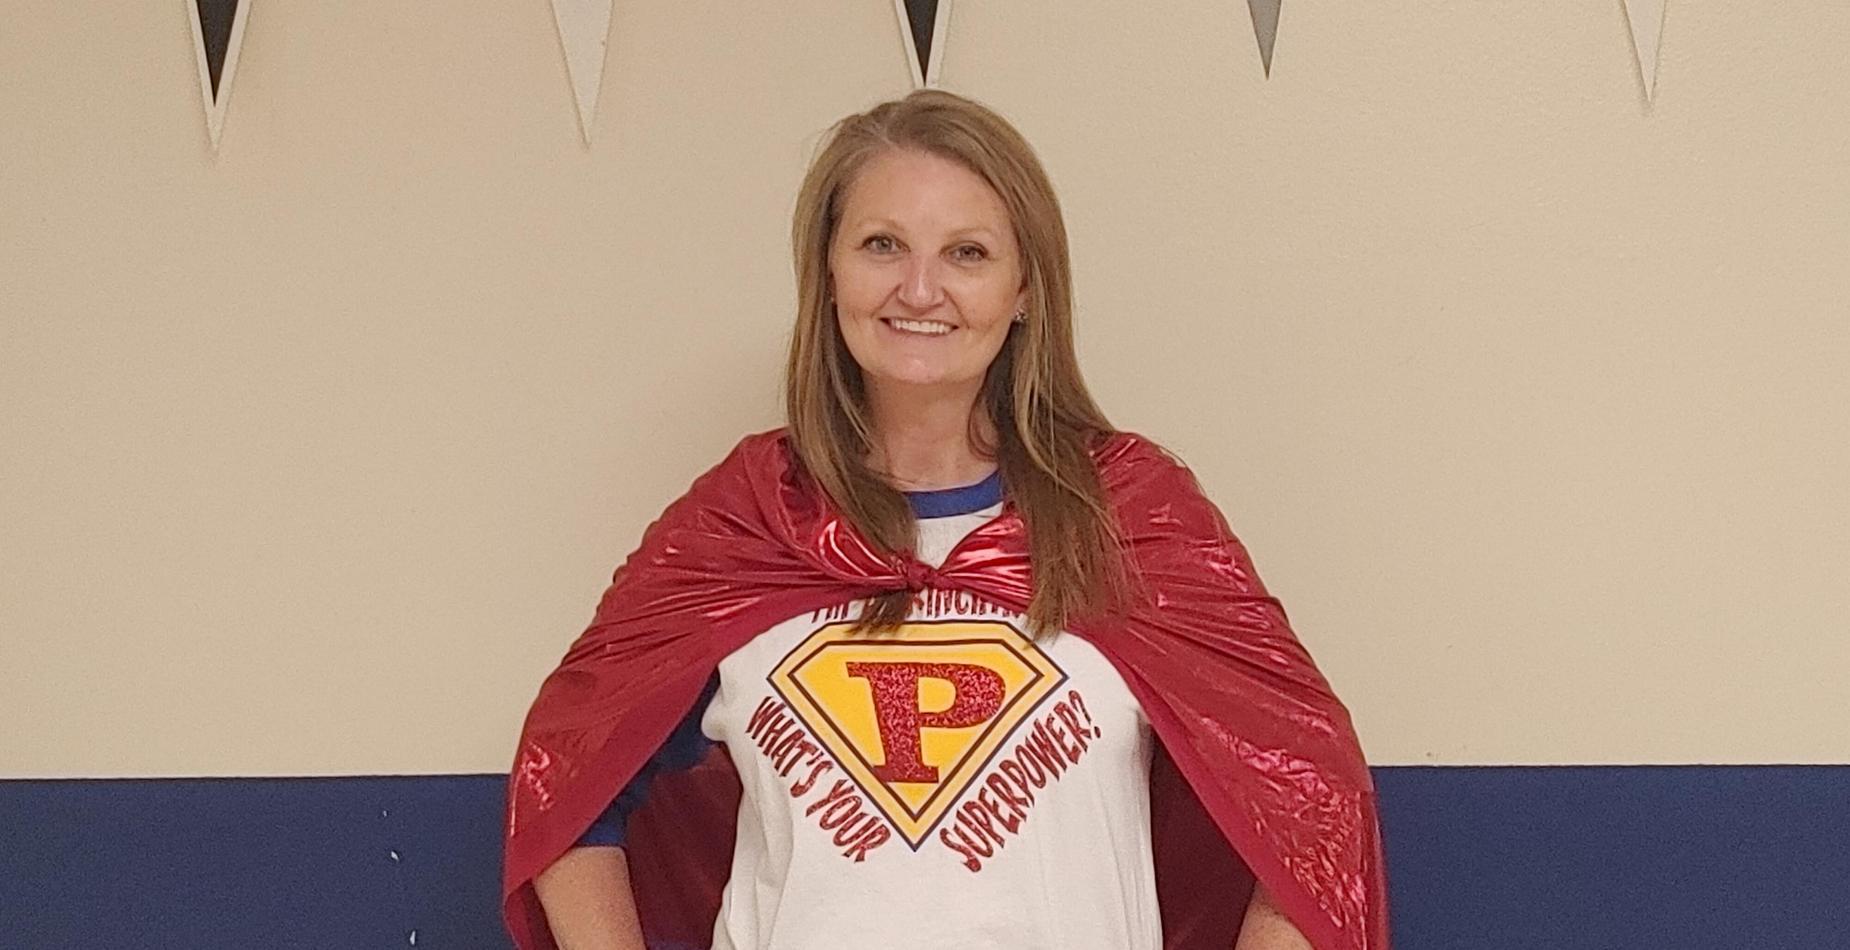 Principal celebrating homecoming week